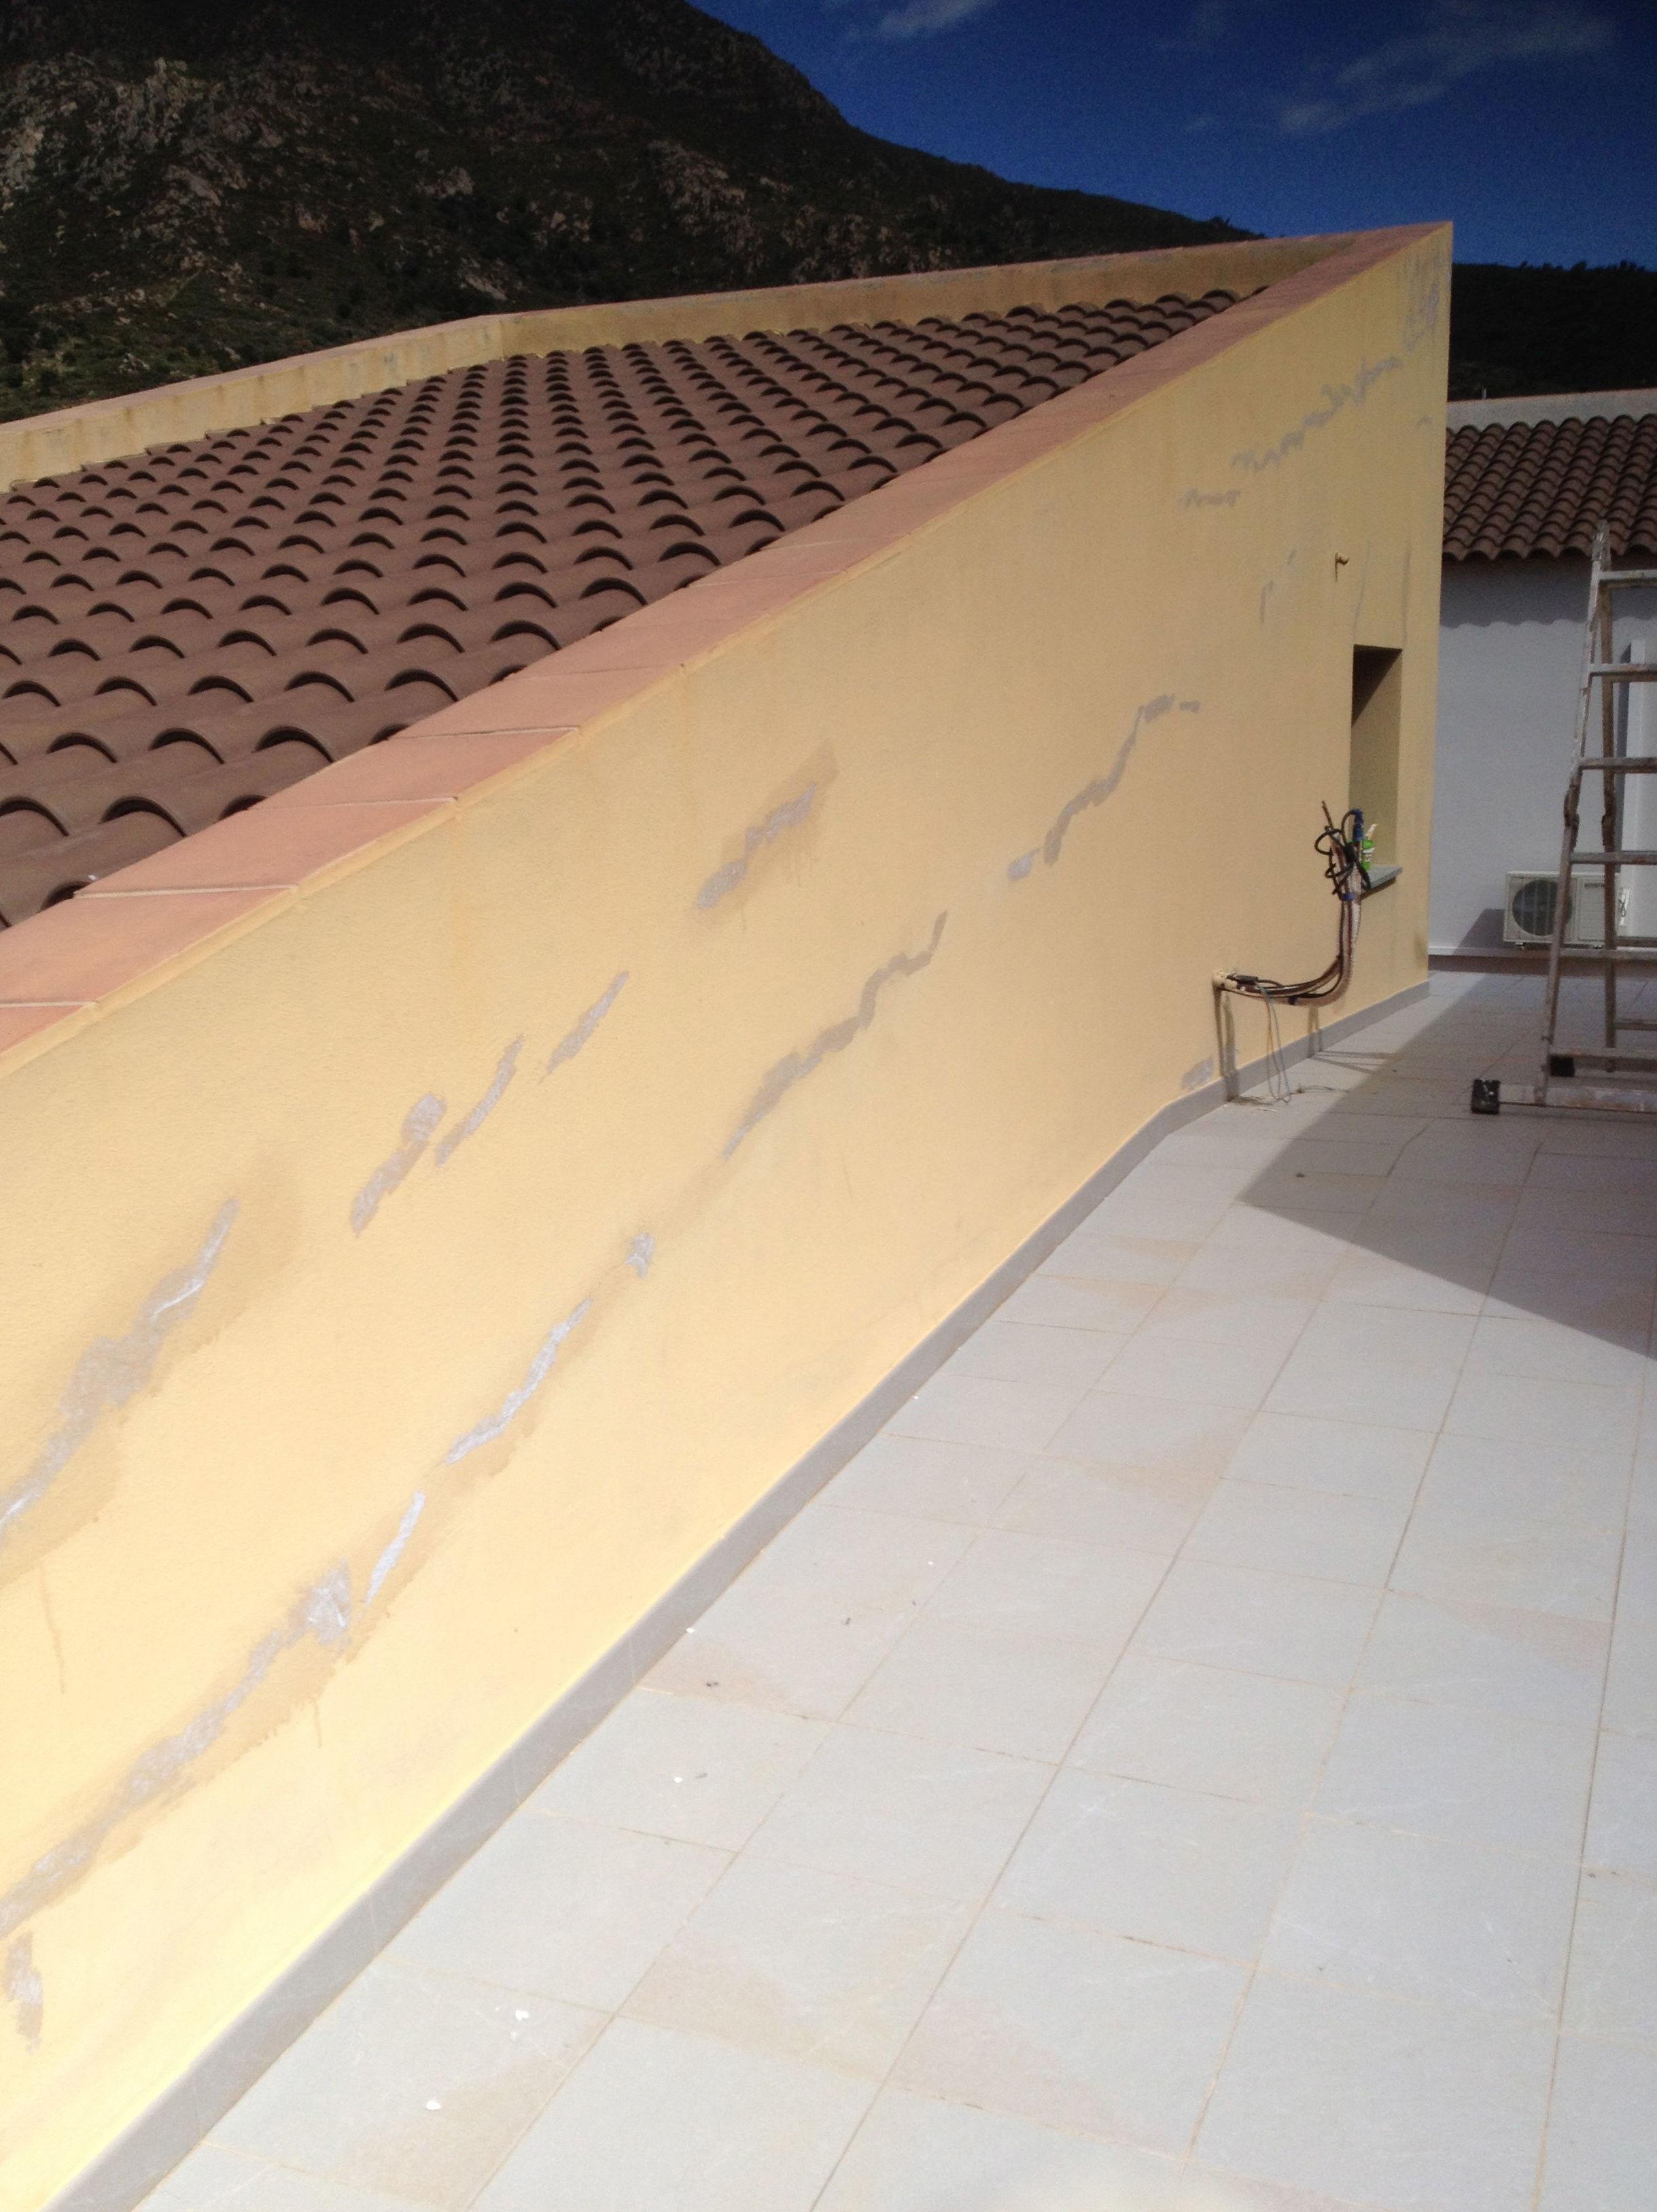 Trabajos de pintura de edificios en Girona